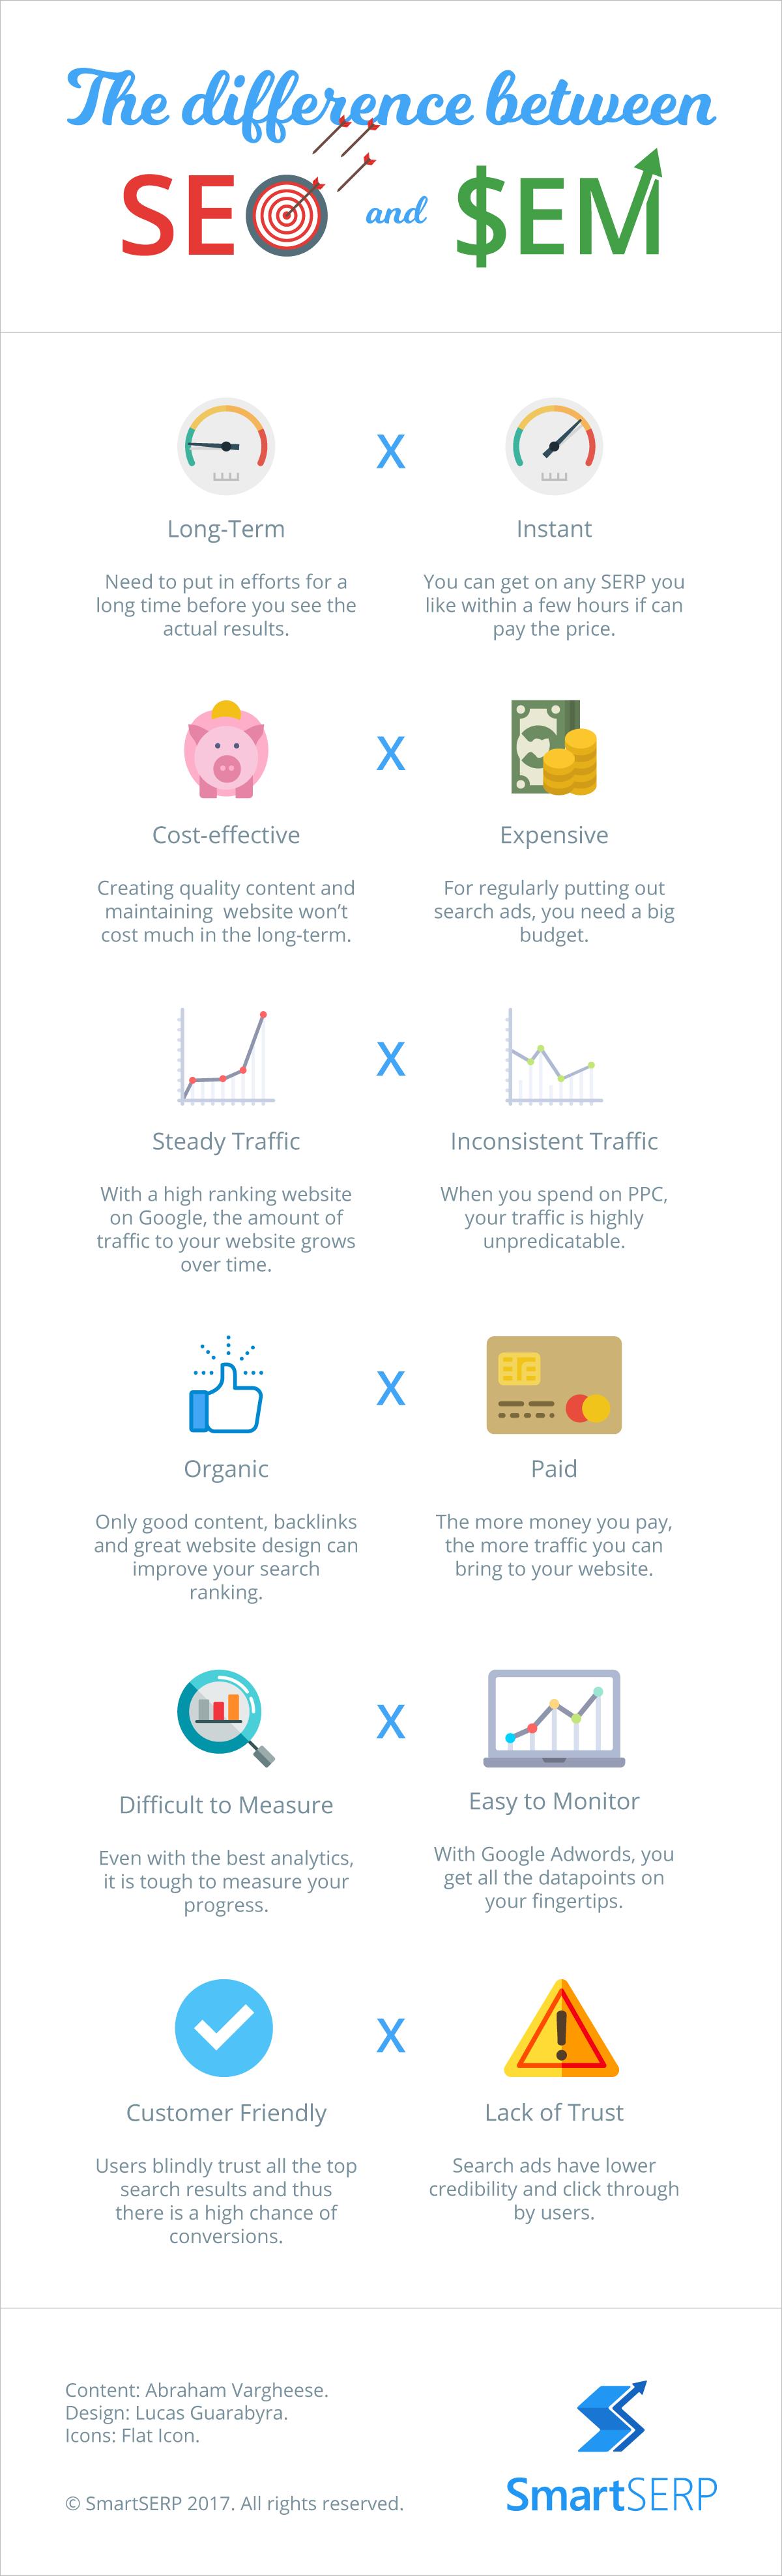 SEO vs SEM infographic